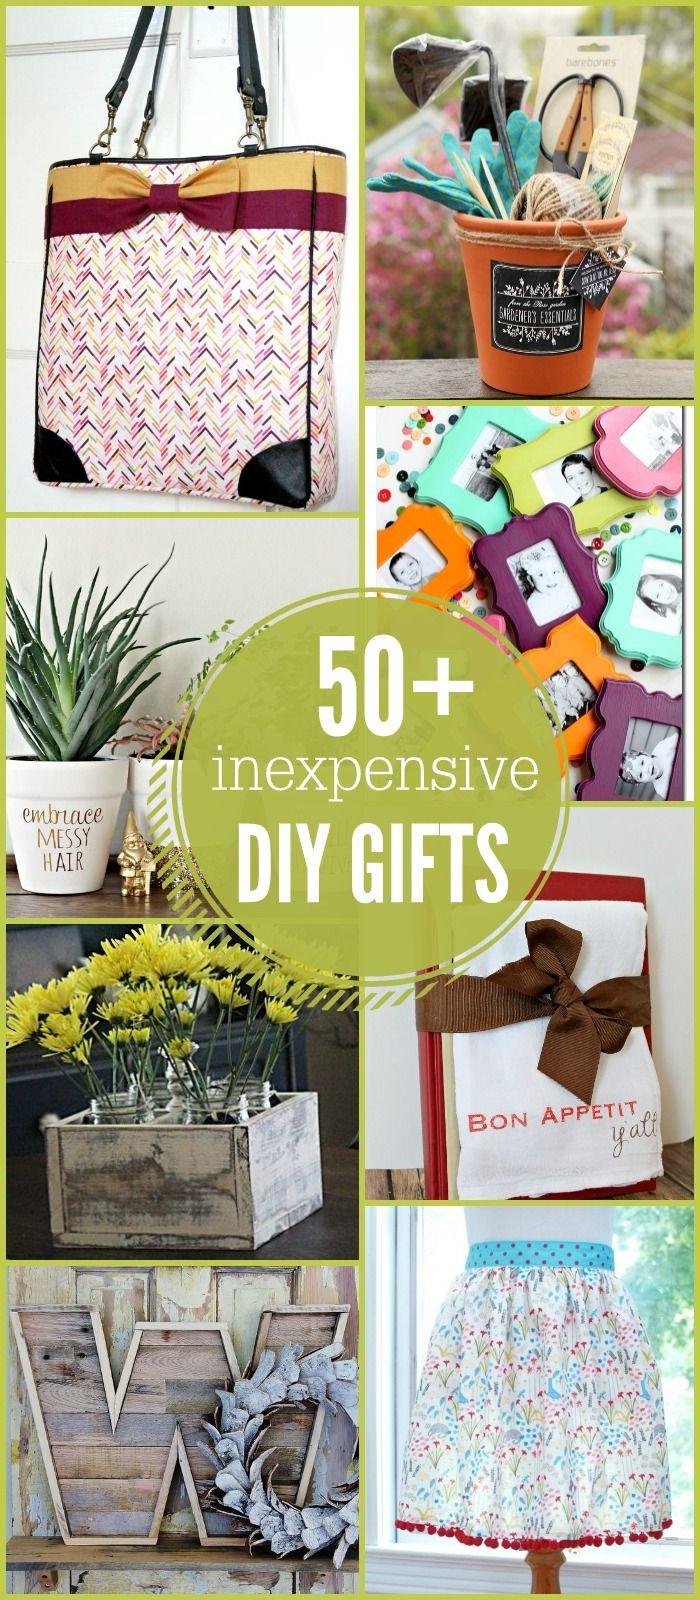 50+ Inexpensive DIY Gift IdeasKristyn – Lil' Luna